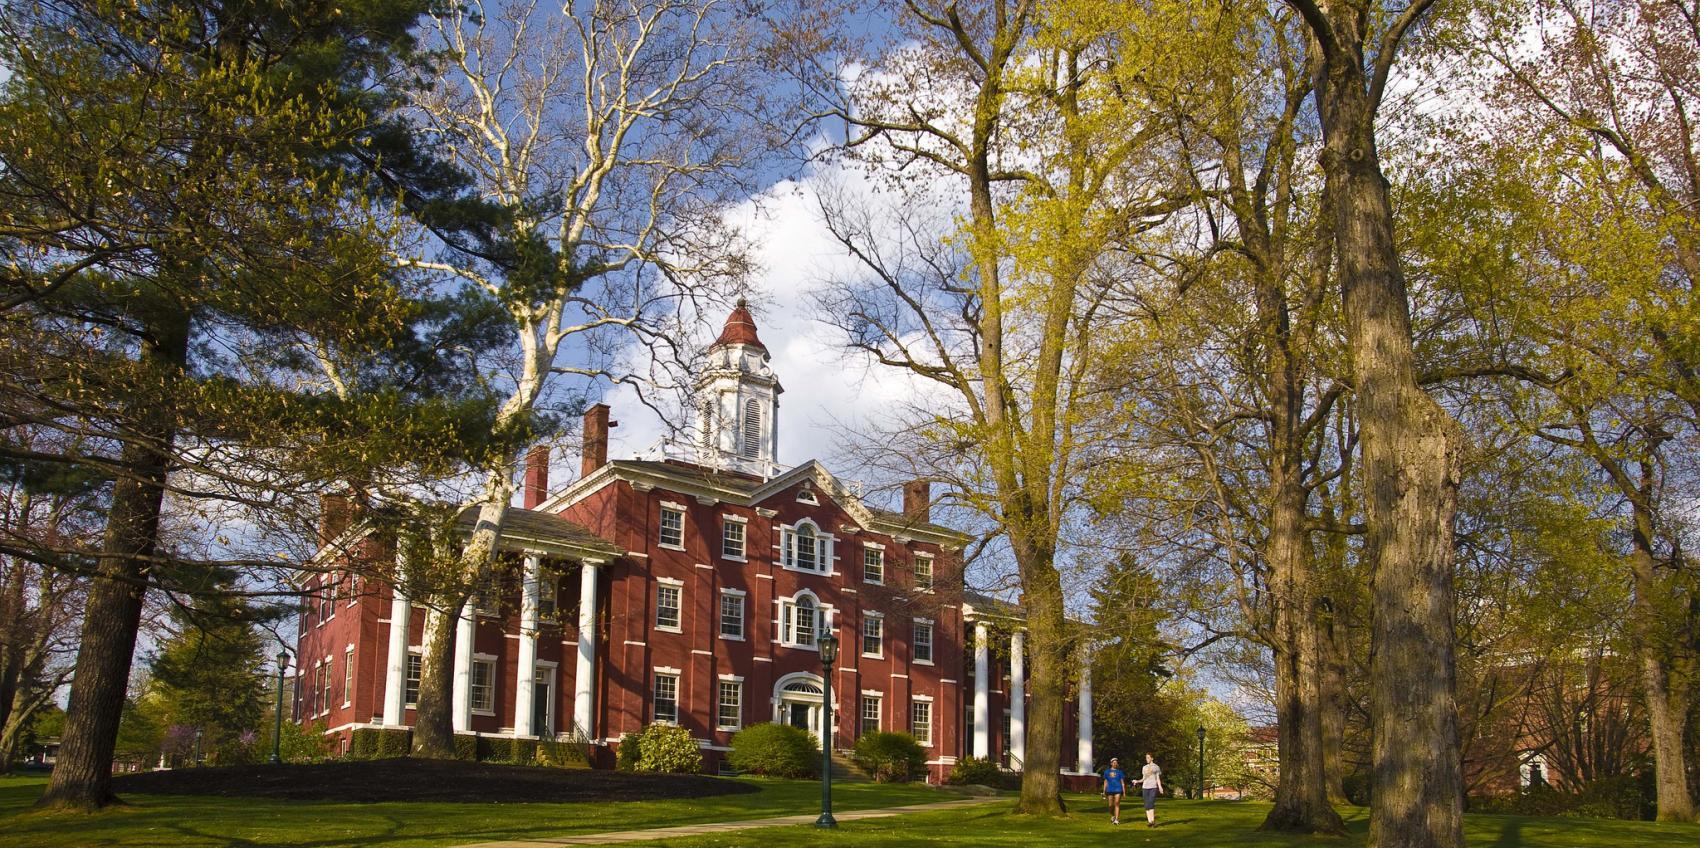 Allegheny College | American Public Gardens Association